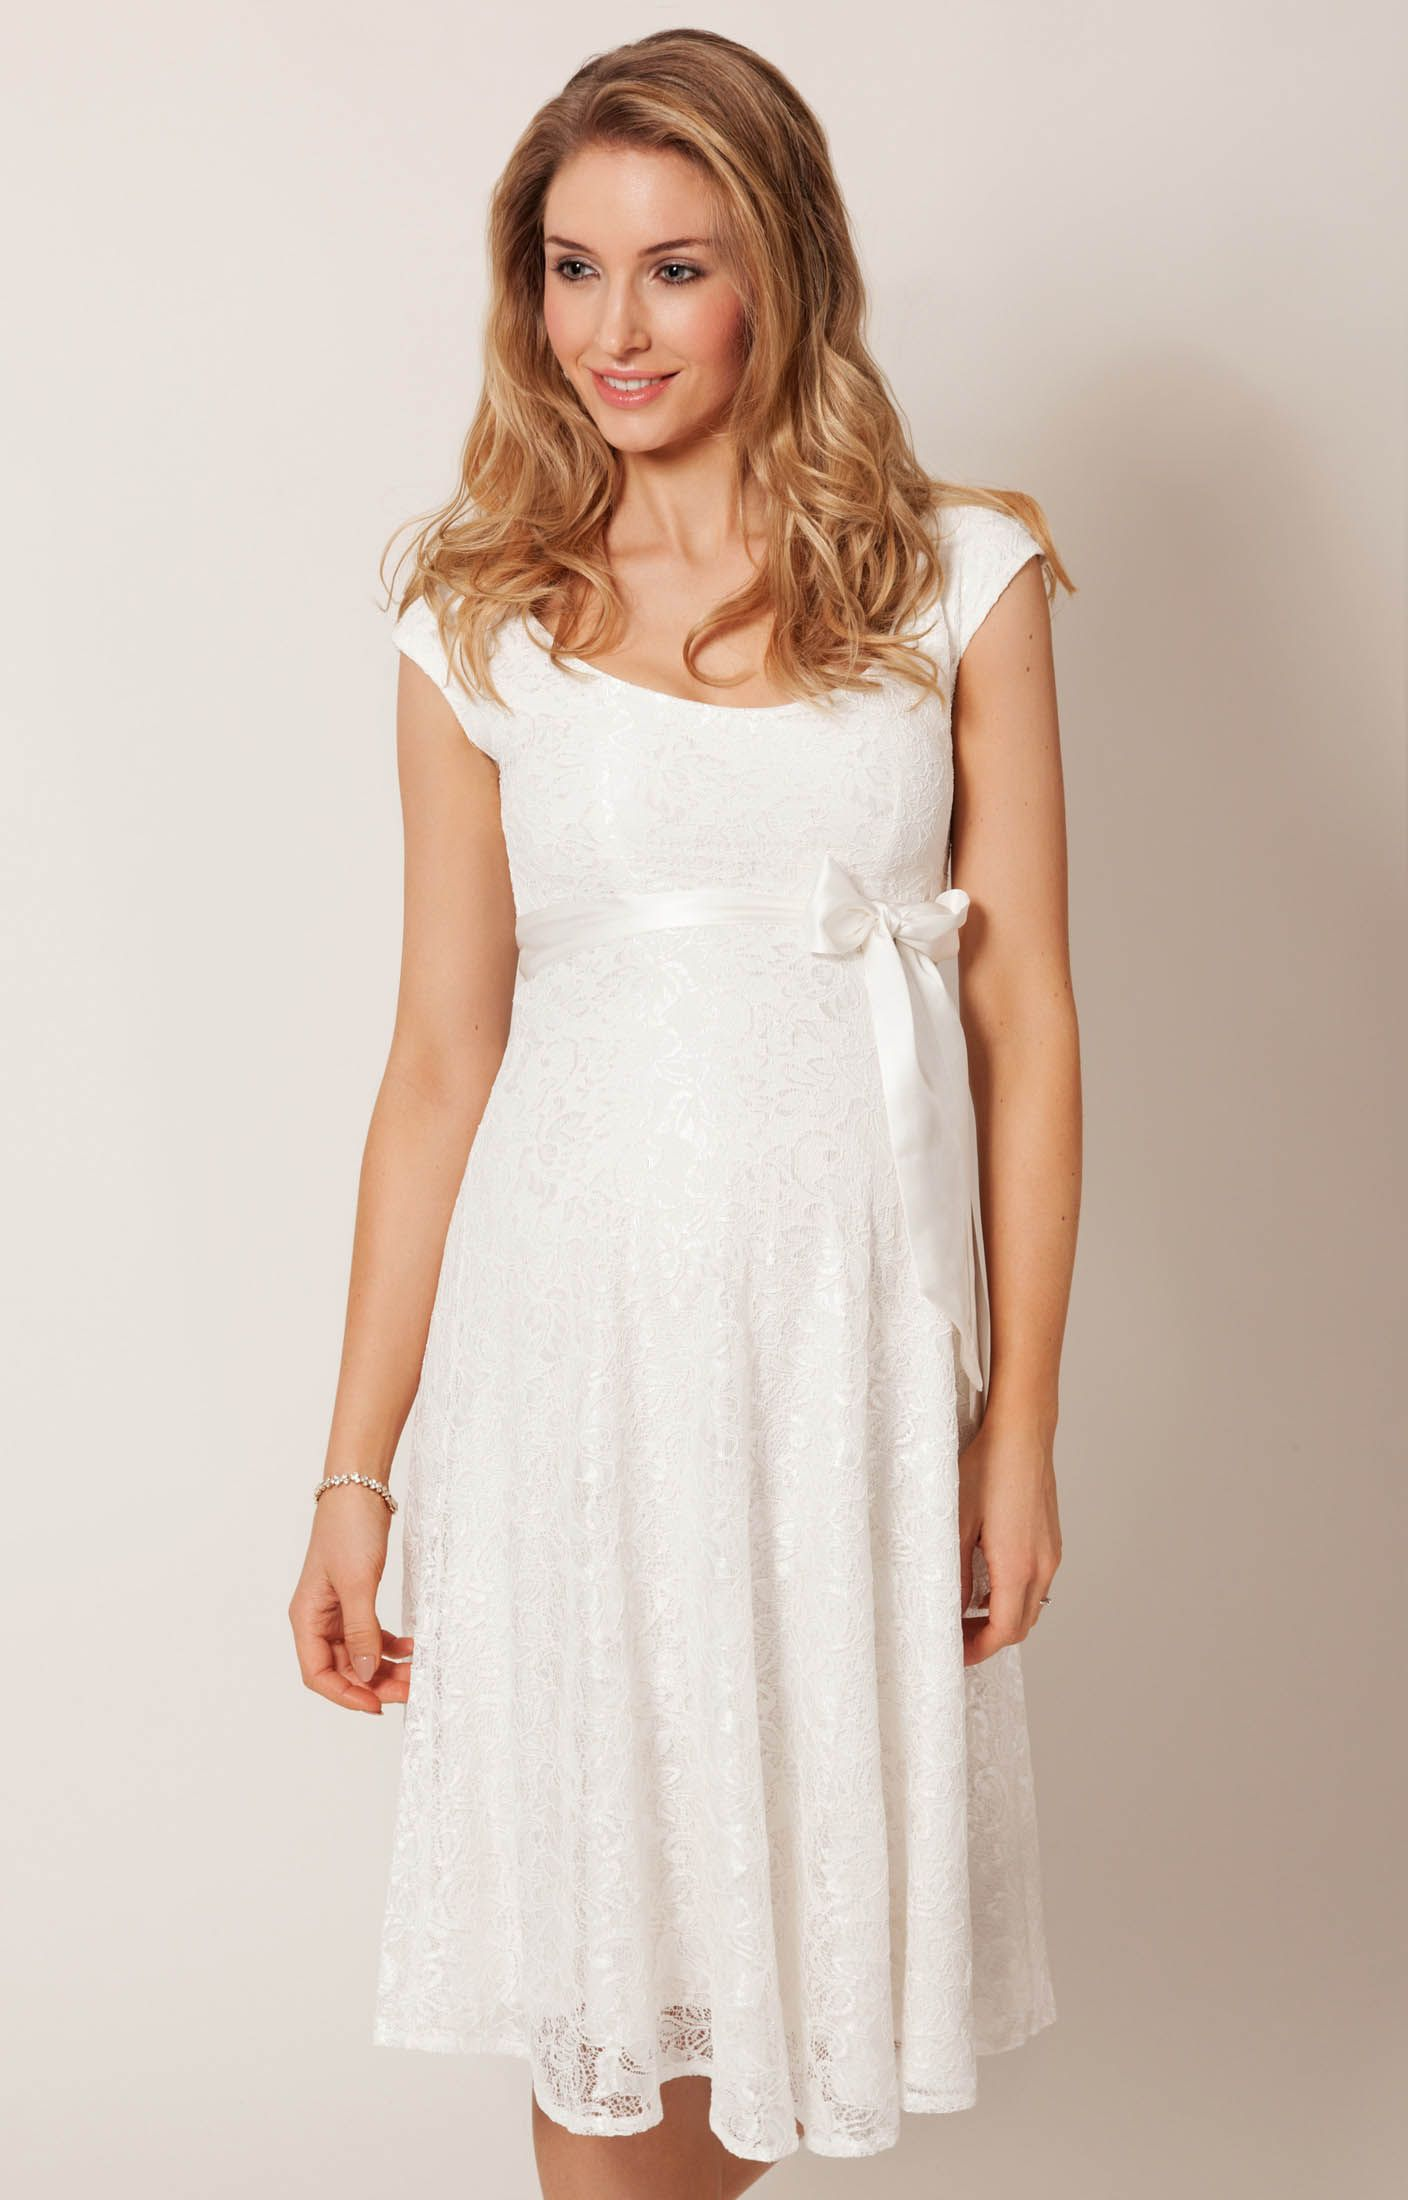 White maternity wedding dress  Eliza Dress  Wedding ideas  Pinterest  Tiffany rose Tiffany and